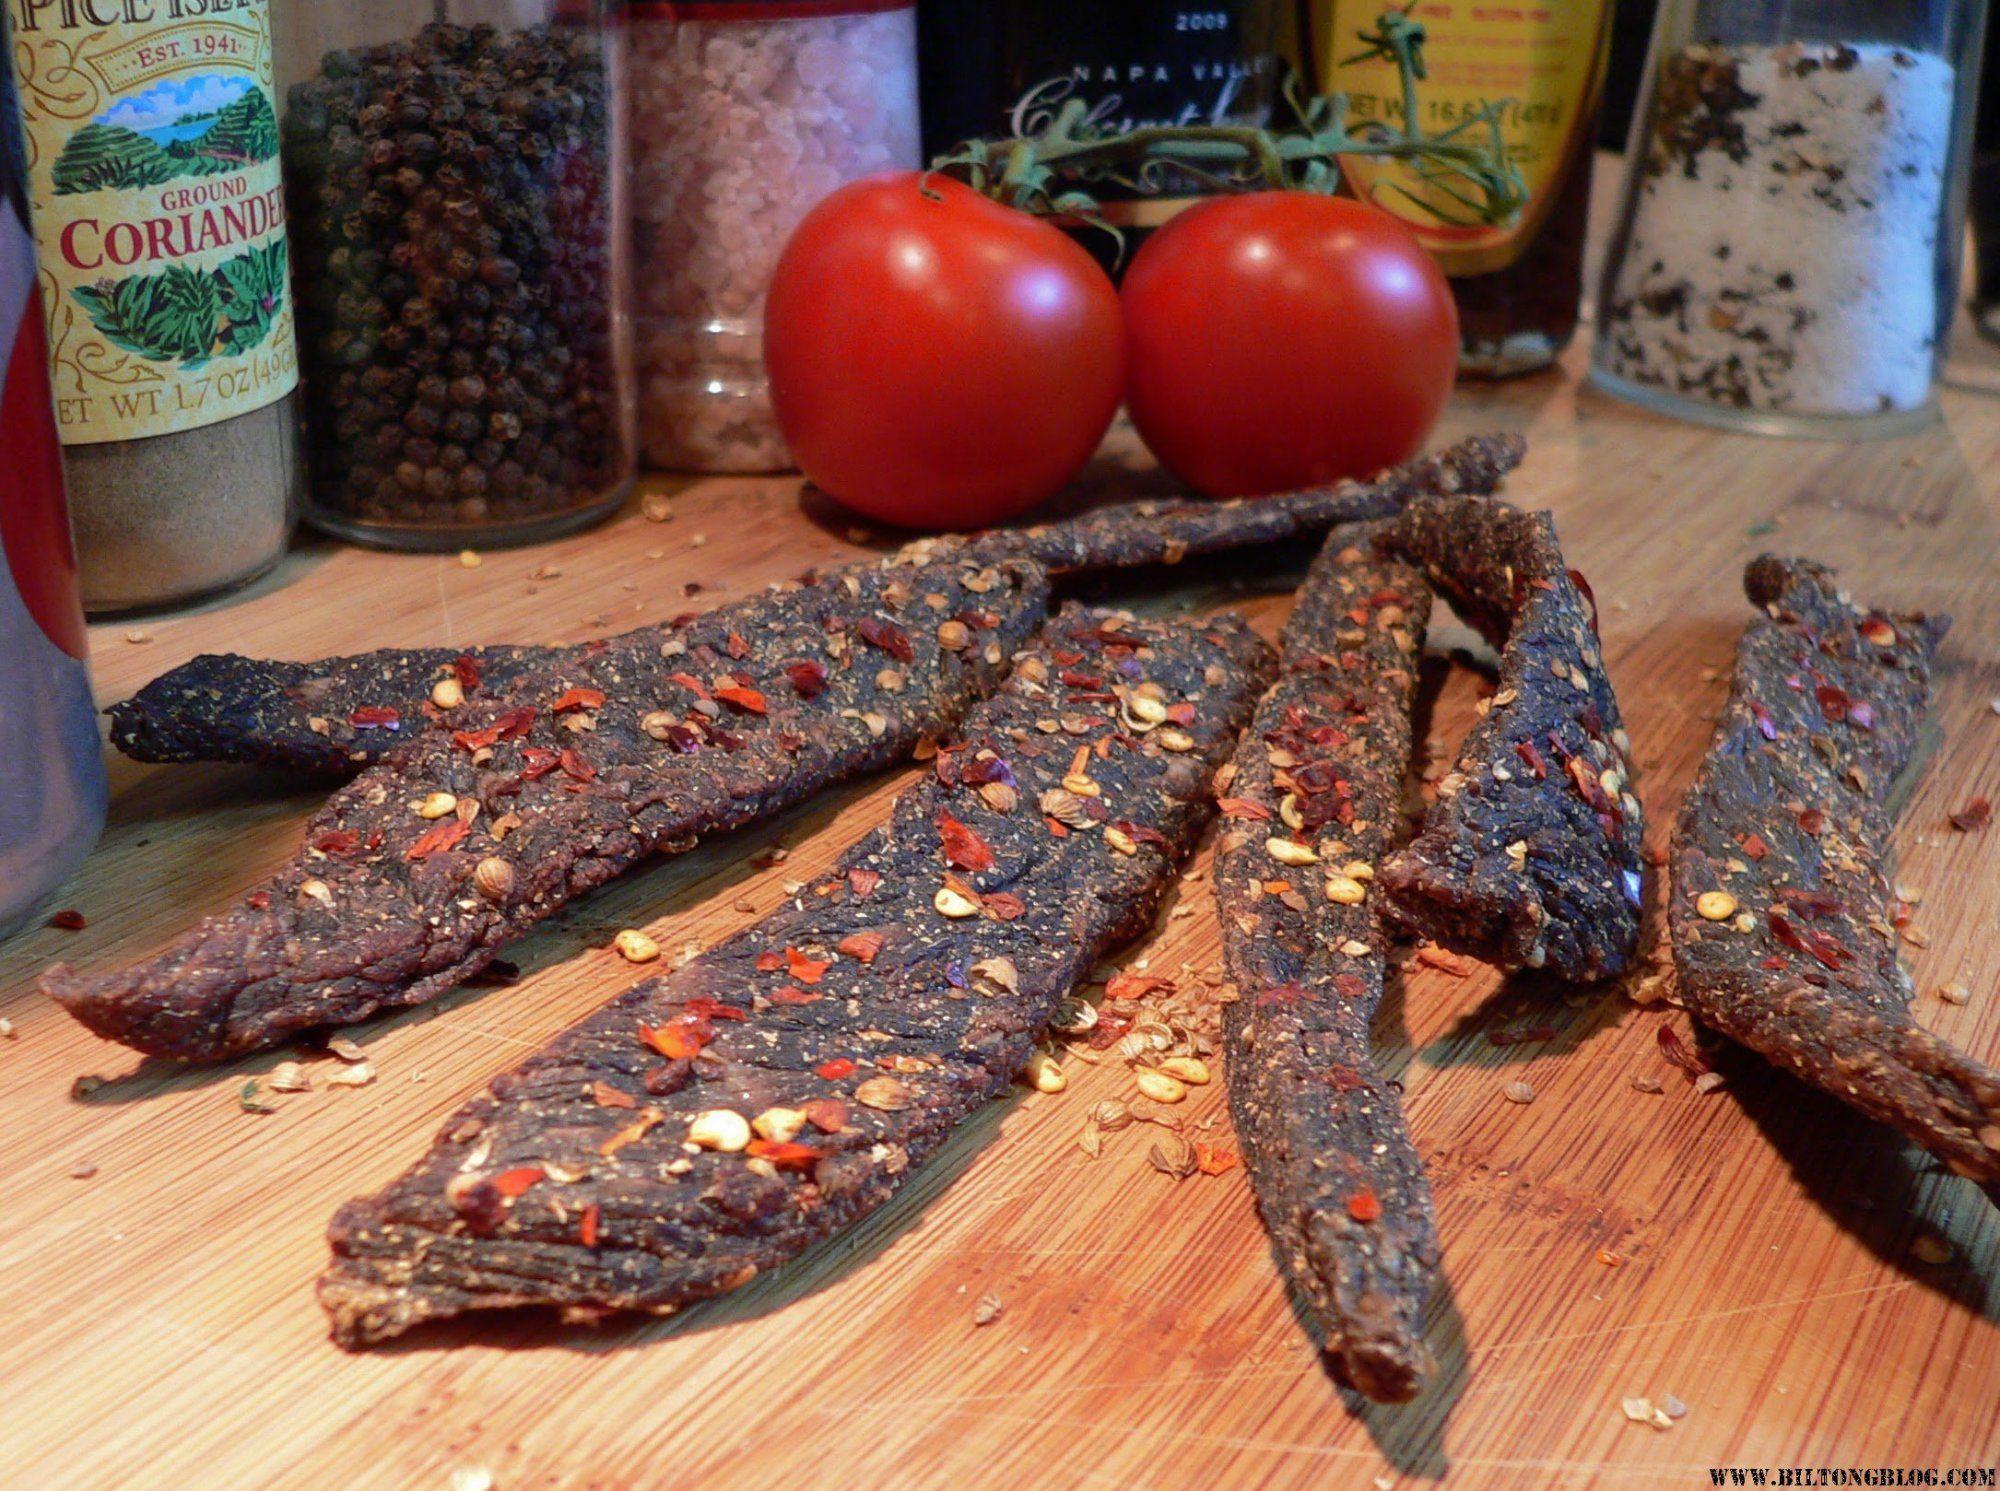 Biltong Peri Peri Chili Snapstick Bites Biltong Peri Peri Recipes Smoked Jerky